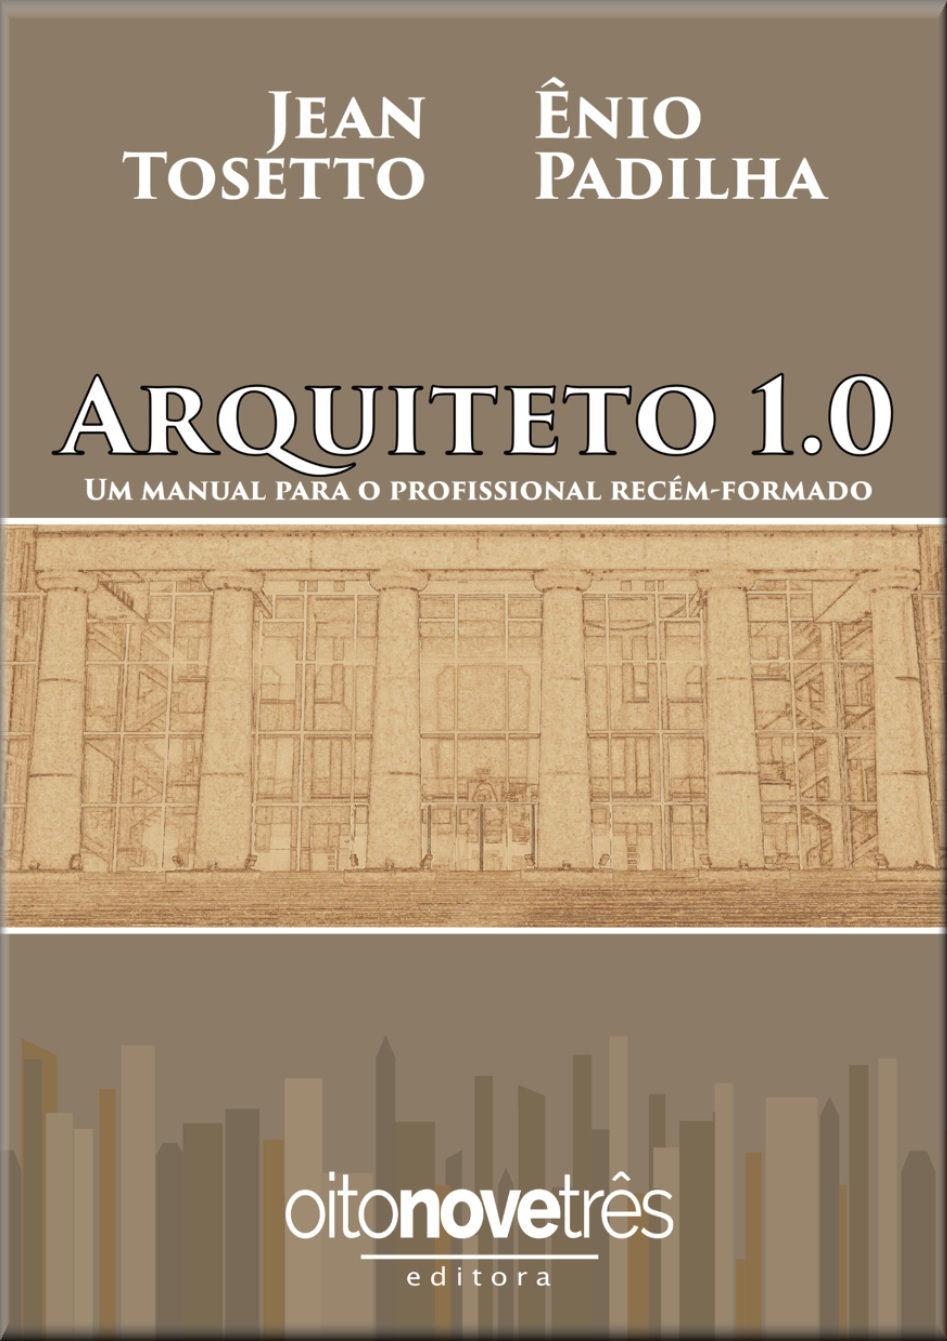 Arquiteto 1.0